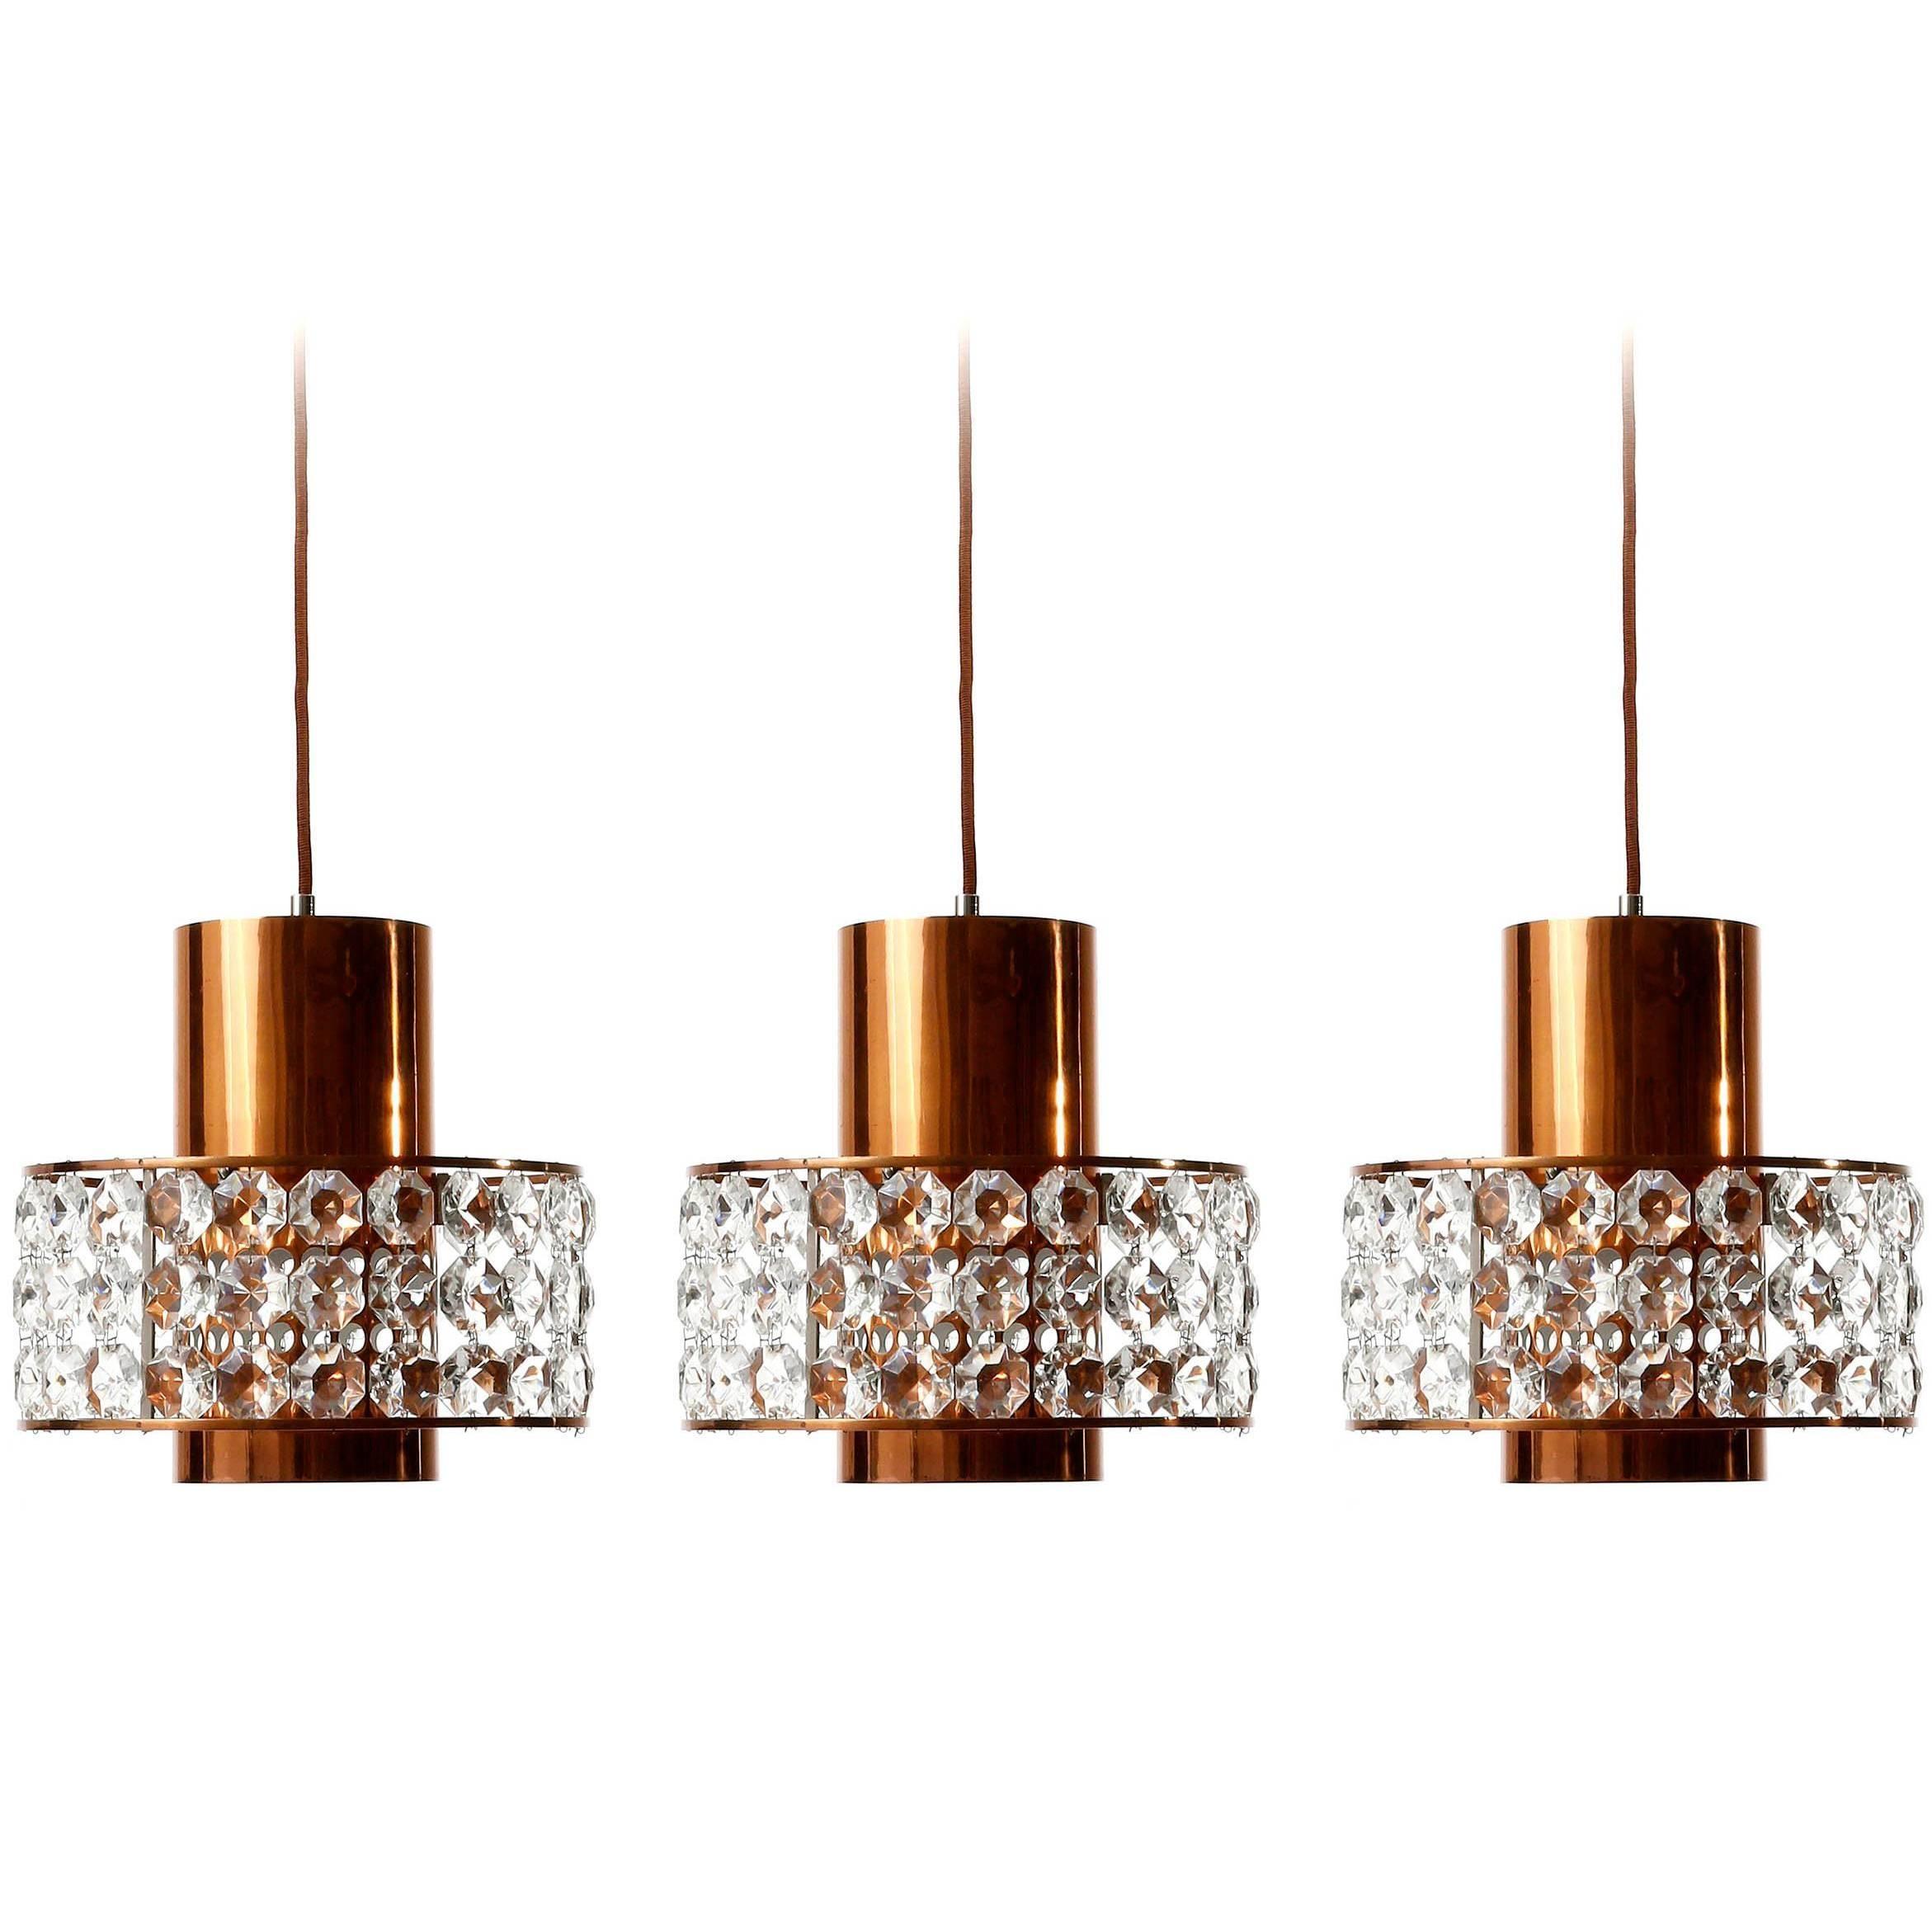 Three Bakalowits Pendant Lights Lanterns, Copper Nickel Crystal Glass, 1960s